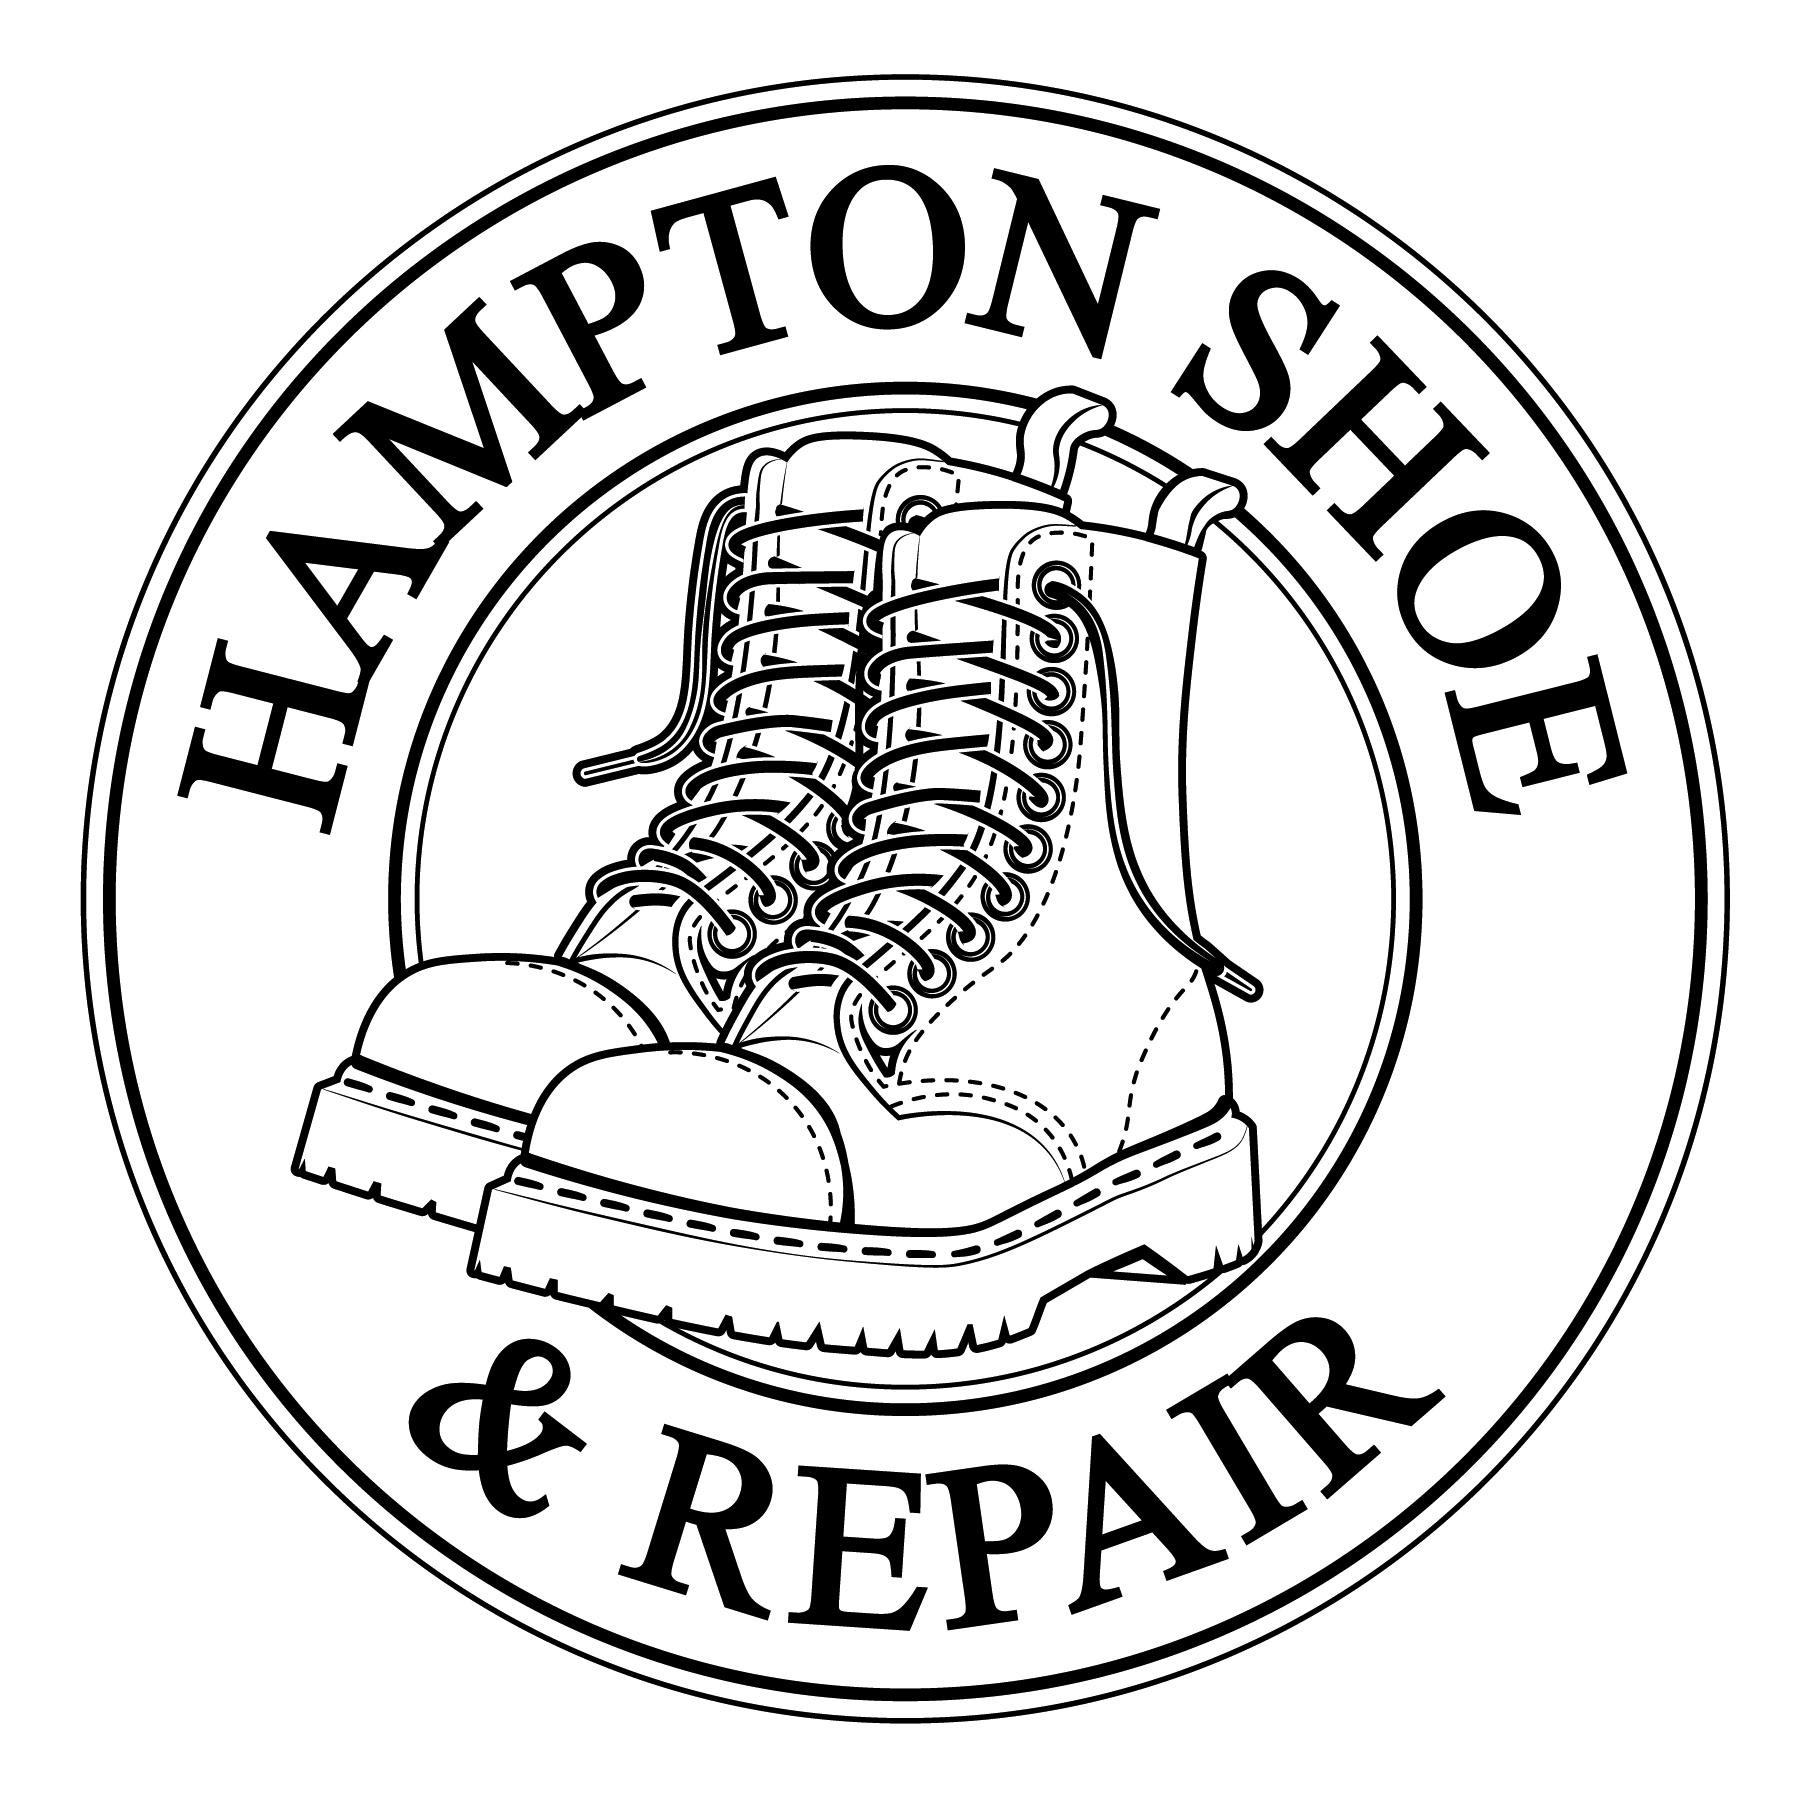 hampton-shoe-logo-boots-bl-on-wh.jpg